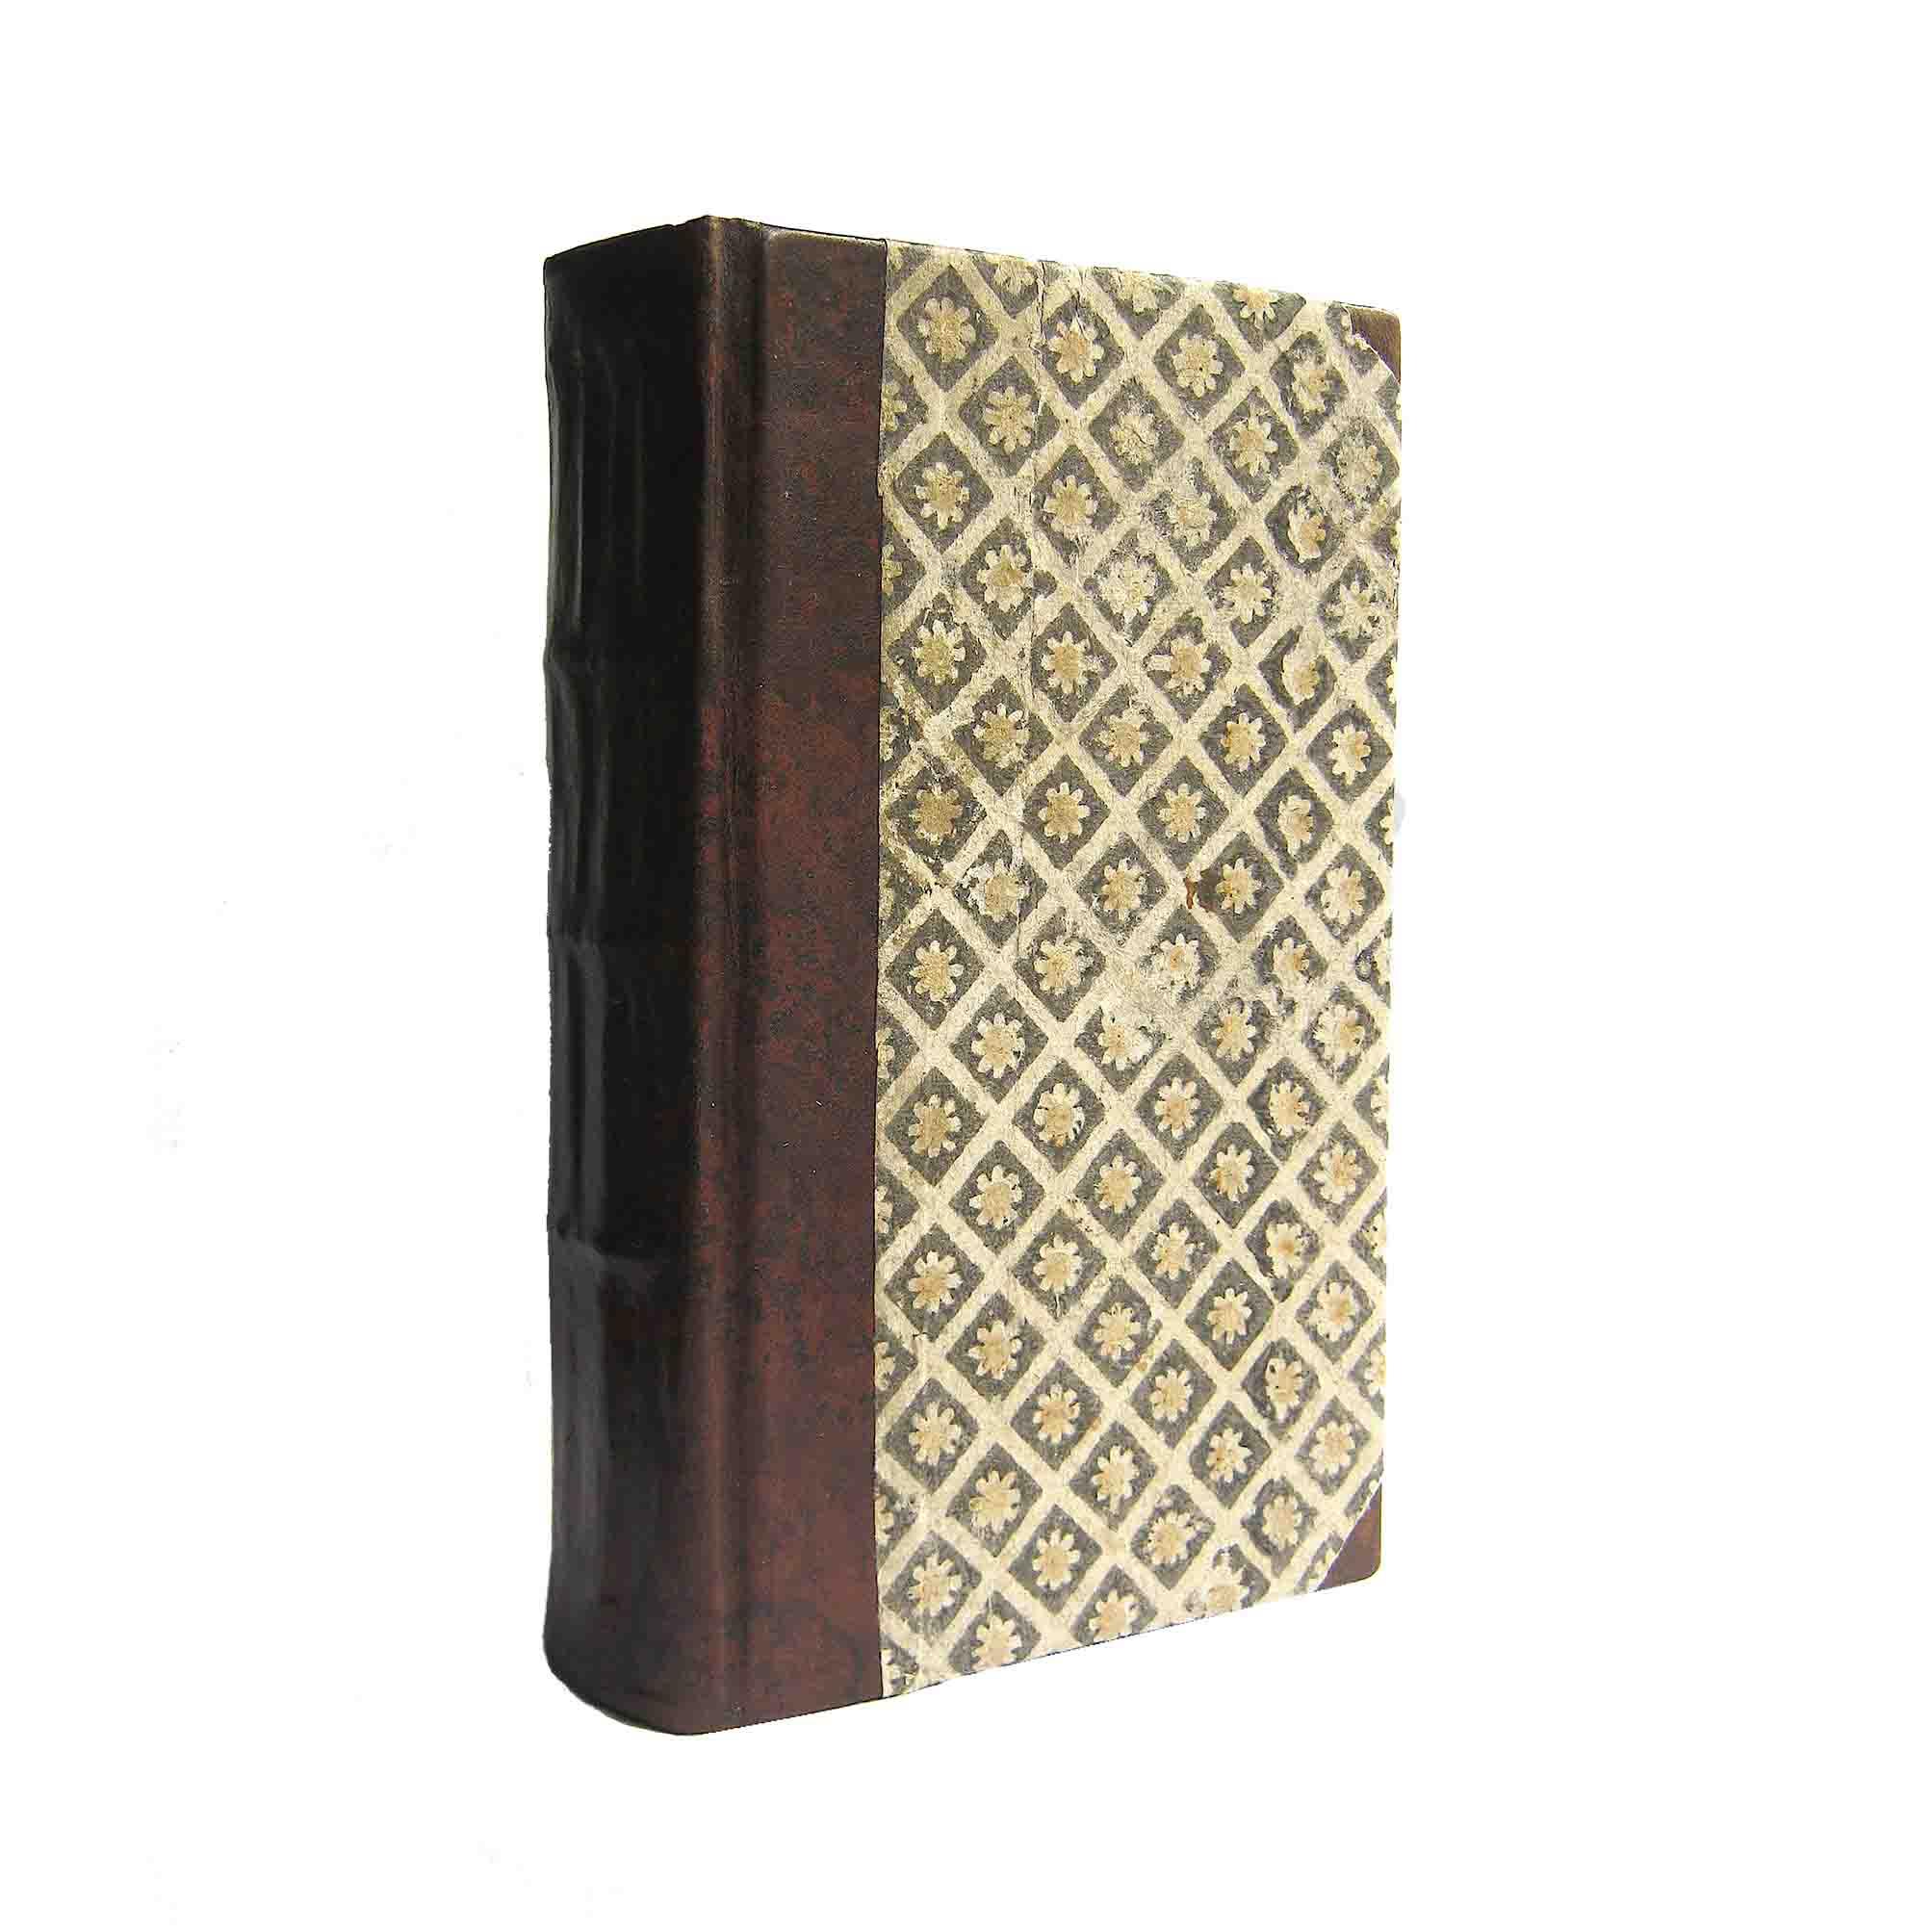 5579-Gartler-Hikmann-Kochbuch-1793-Einband-2-frei-N.jpg